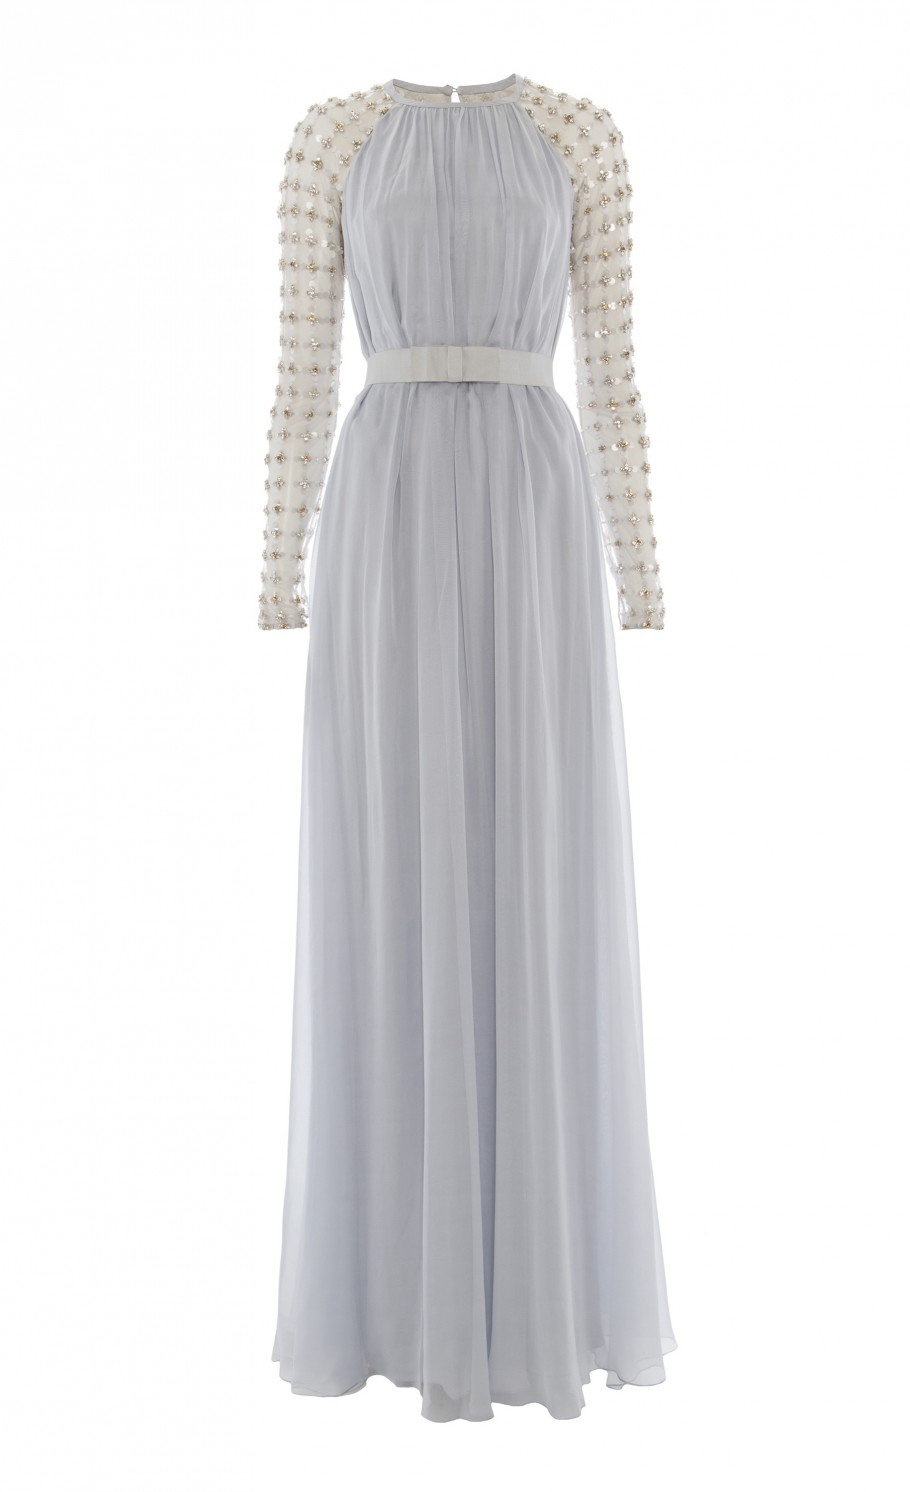 7c9d21159bfd Lyst - Temperley London Long Angeli Lattice Dress in Gray